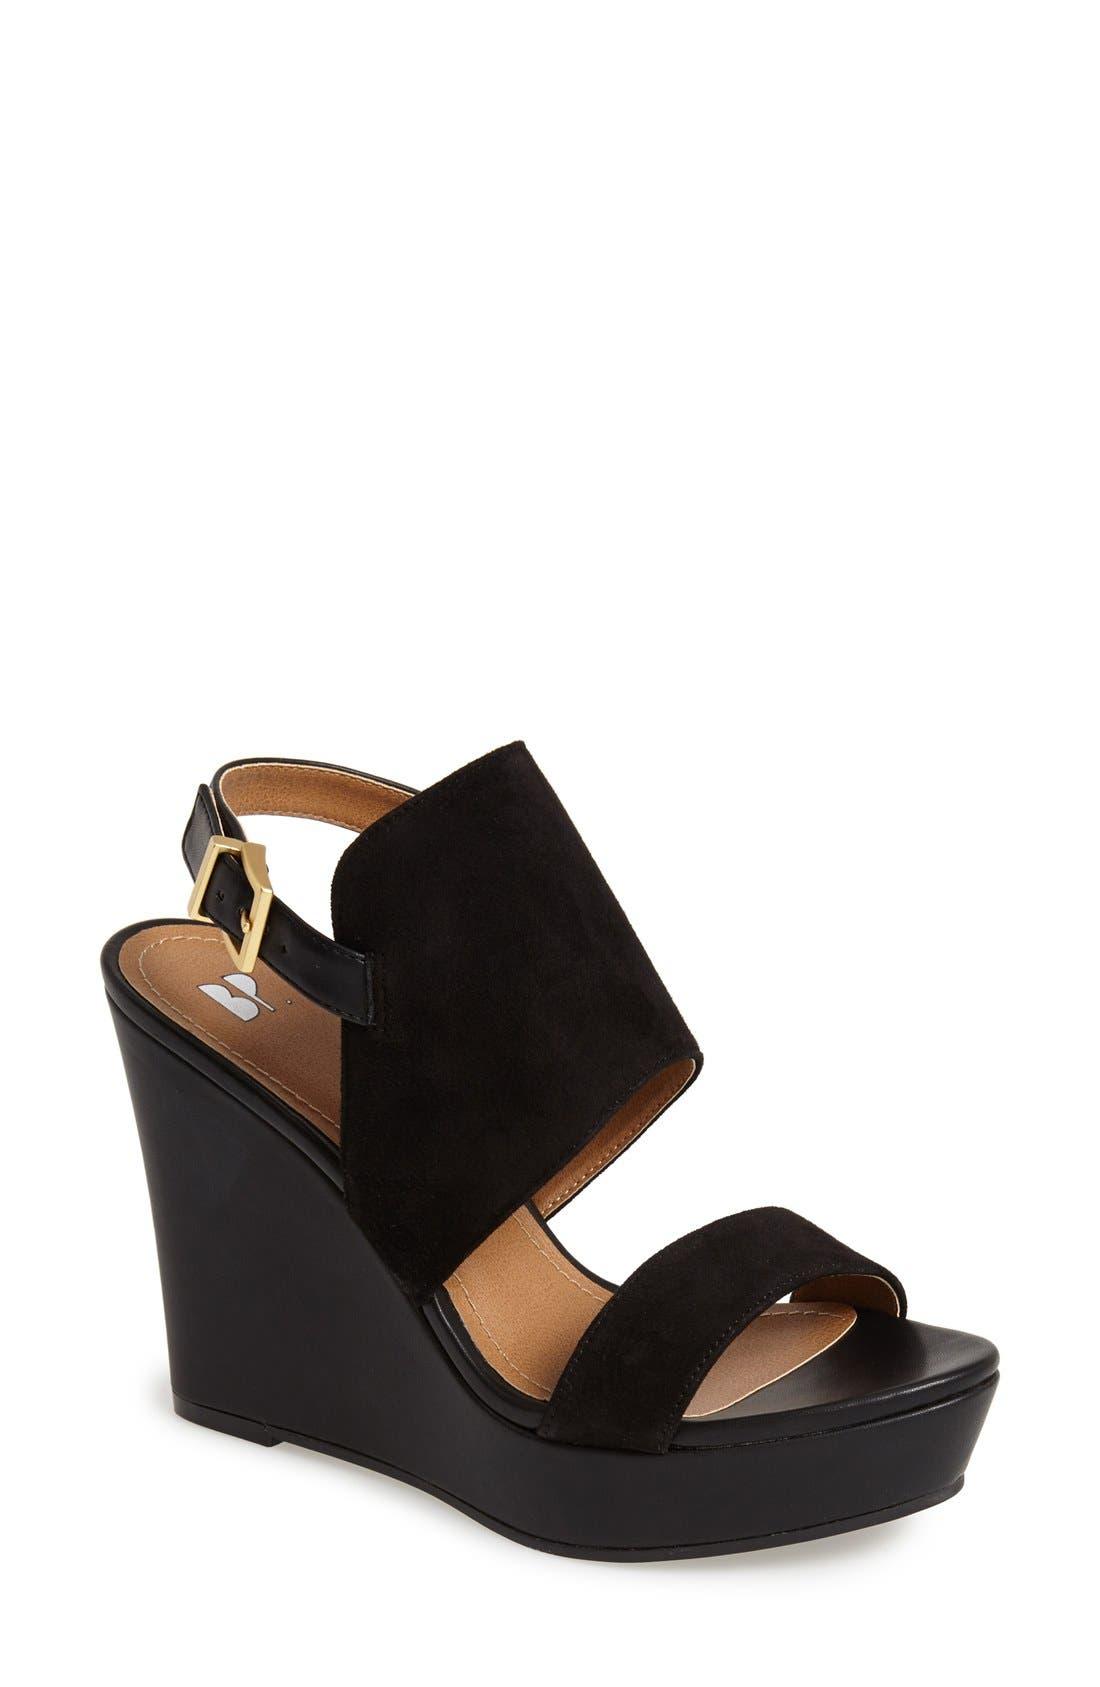 'Lena' Wedge Sandal, Main, color, 001